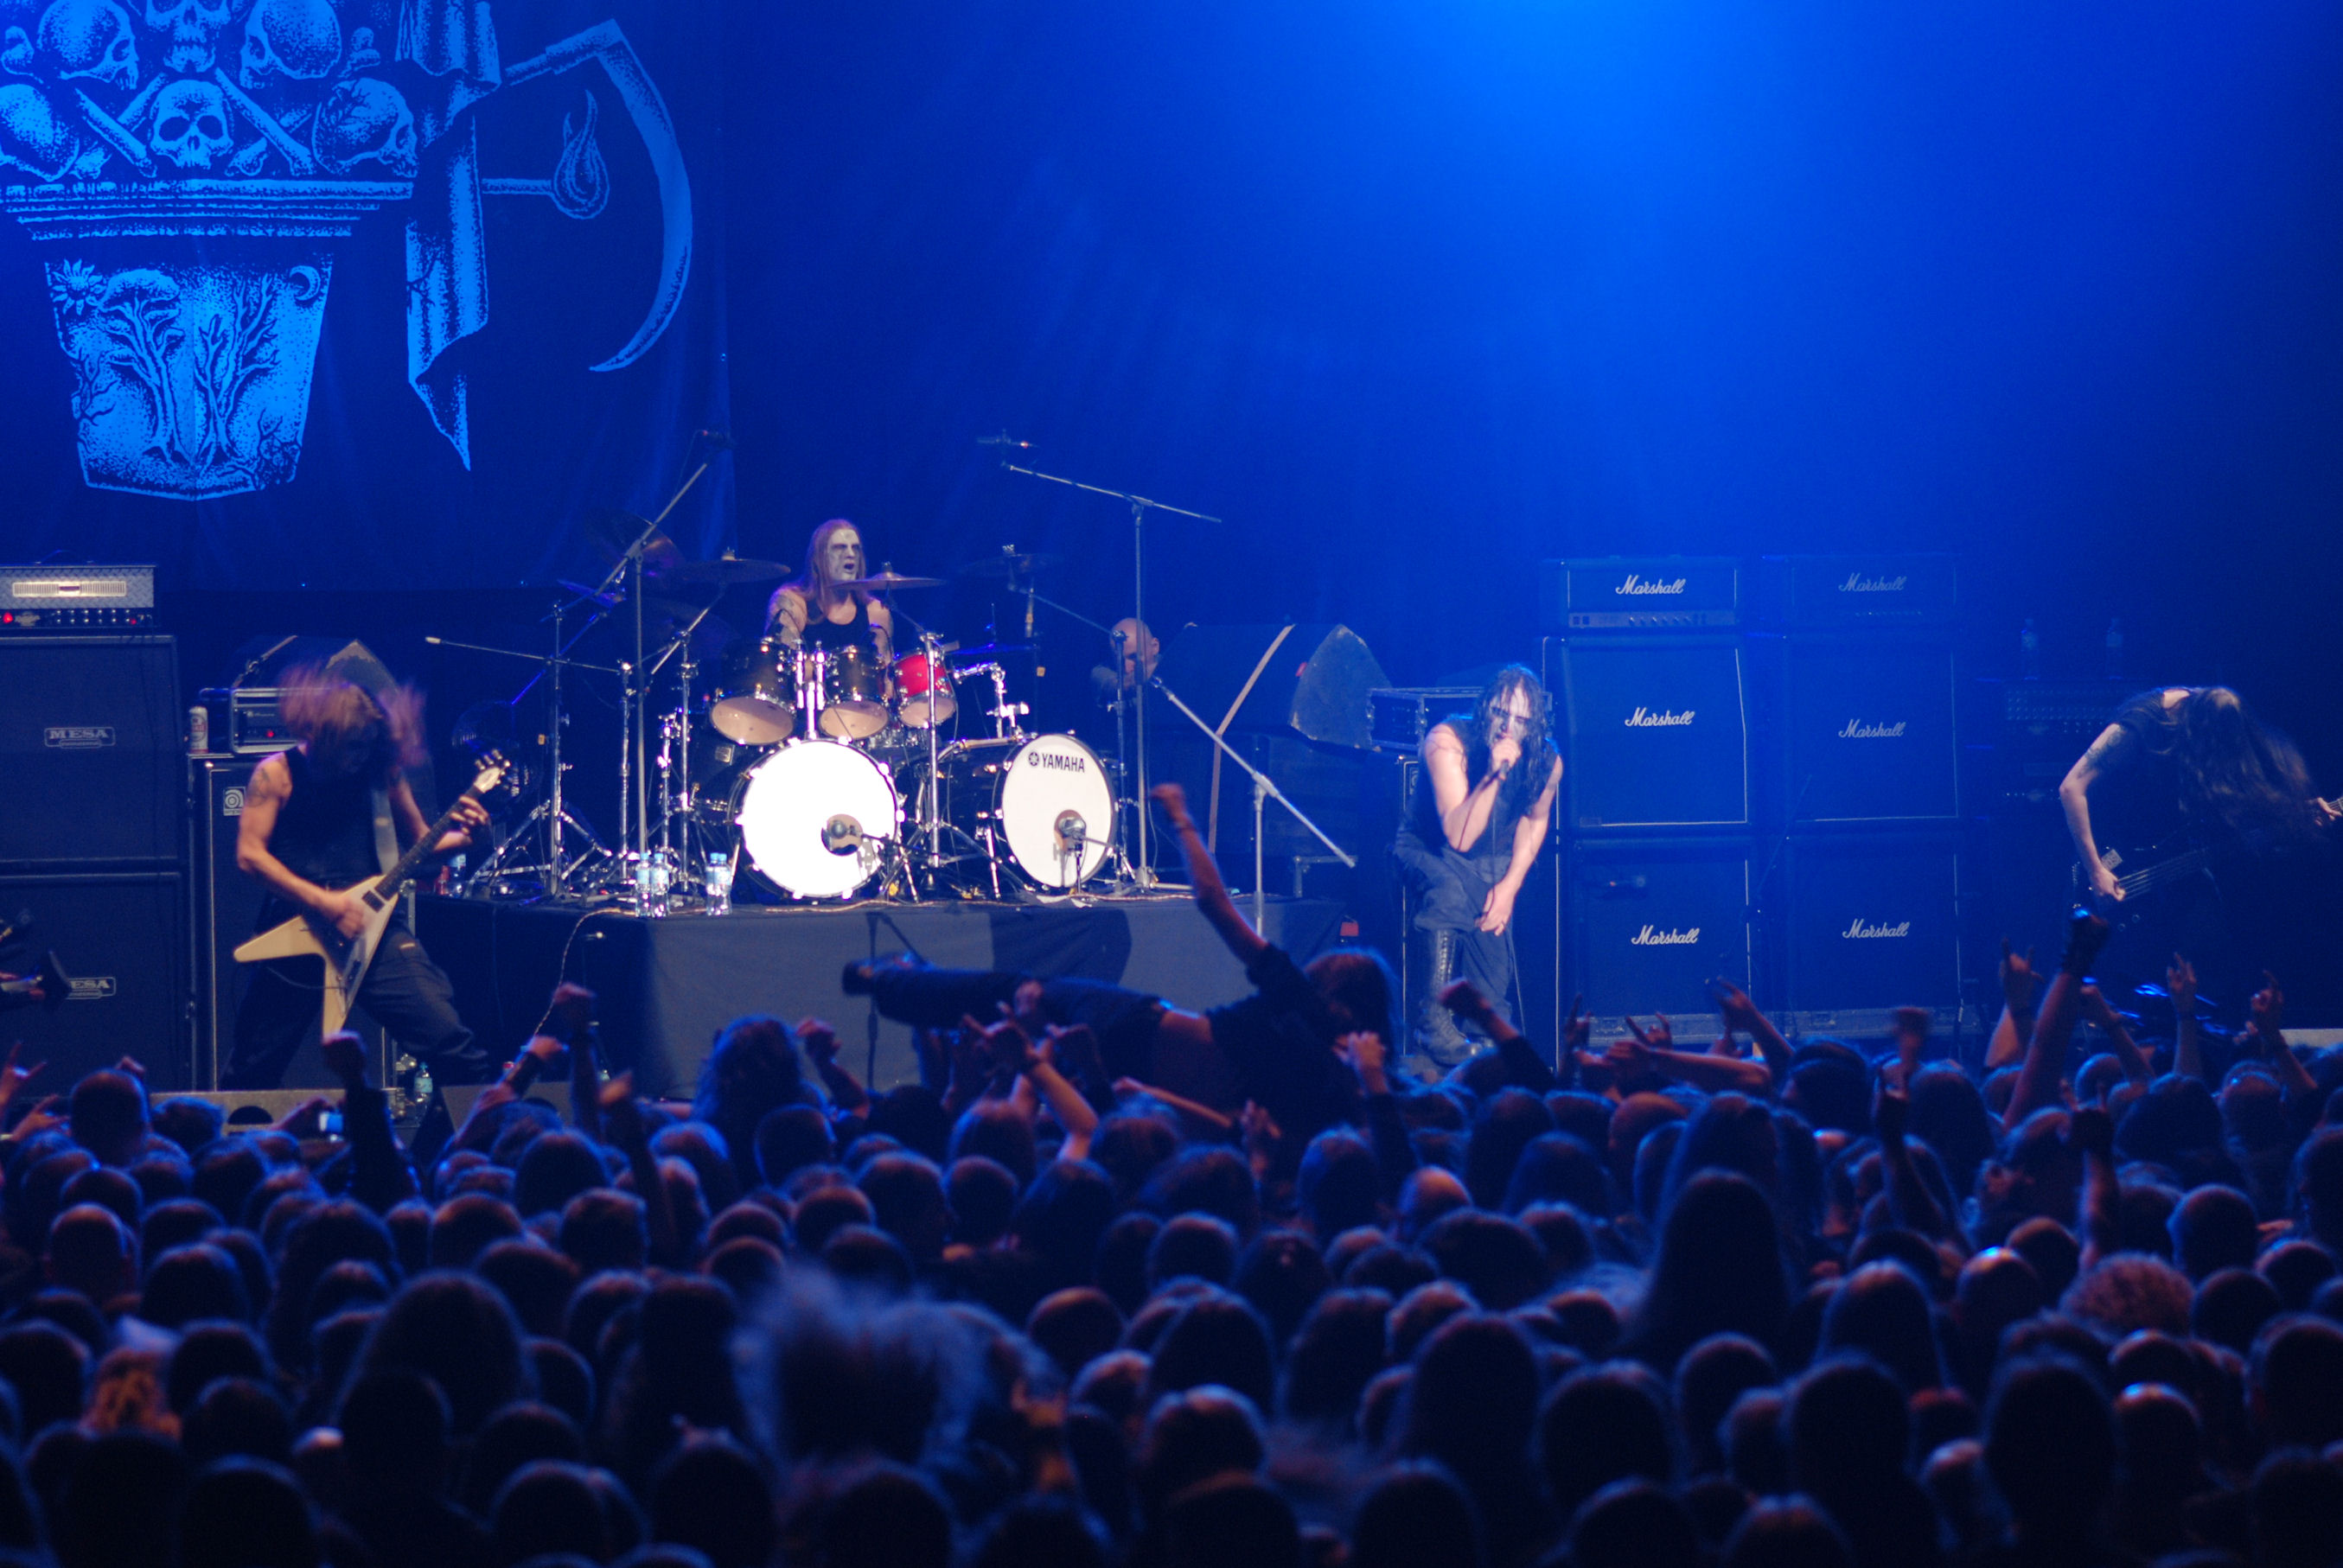 Pics photos rock concert background - Marduk Black Metal Heavy Hard Rock Dark Microphone Guitar Guitars Concert Concerts F Wallpaper 2710x1814 86272 Wallpaperup